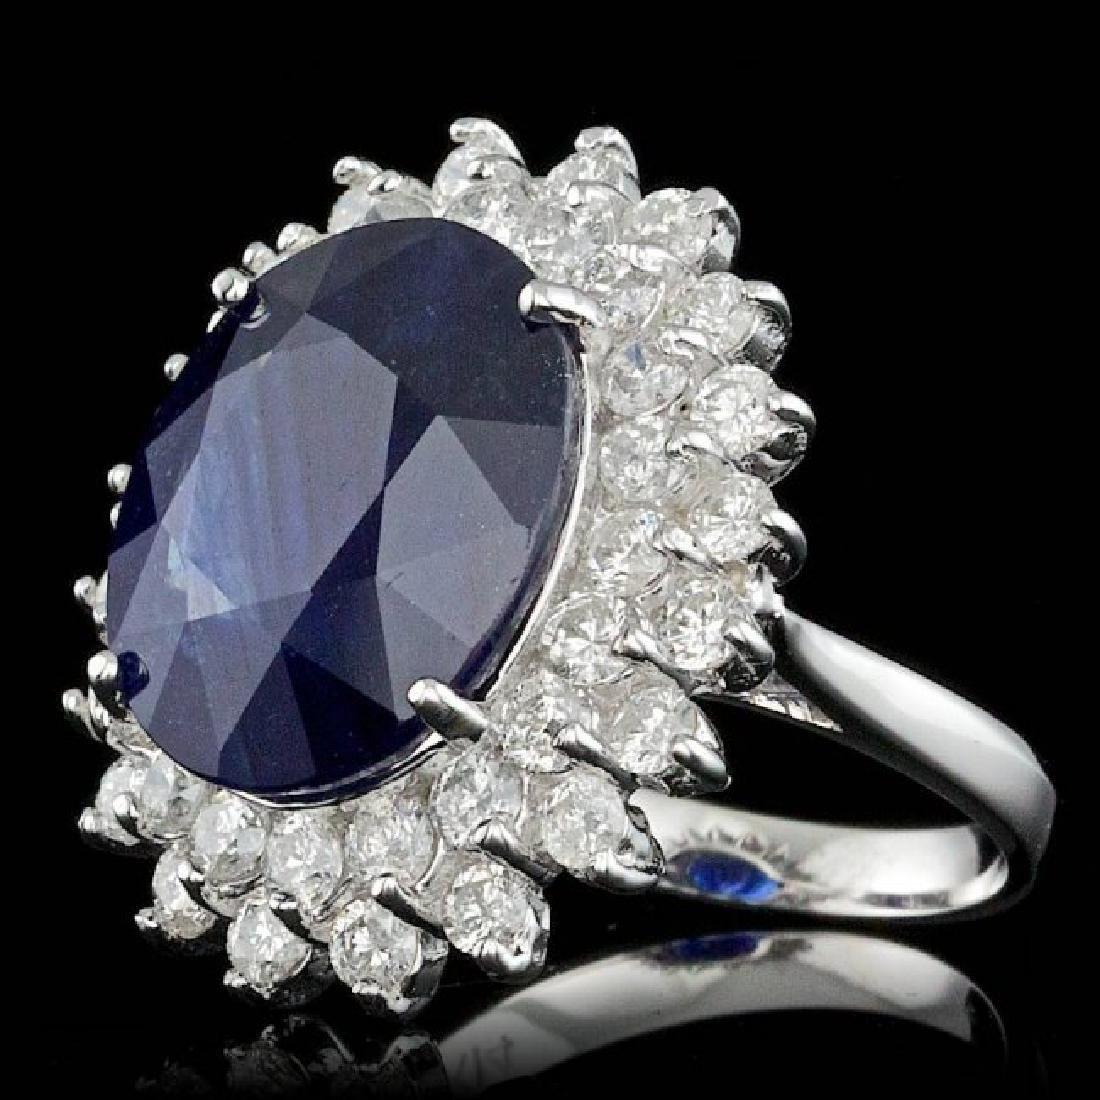 14k Gold 13.50ct Sapphire 2.25ct Diamond Ring - 2